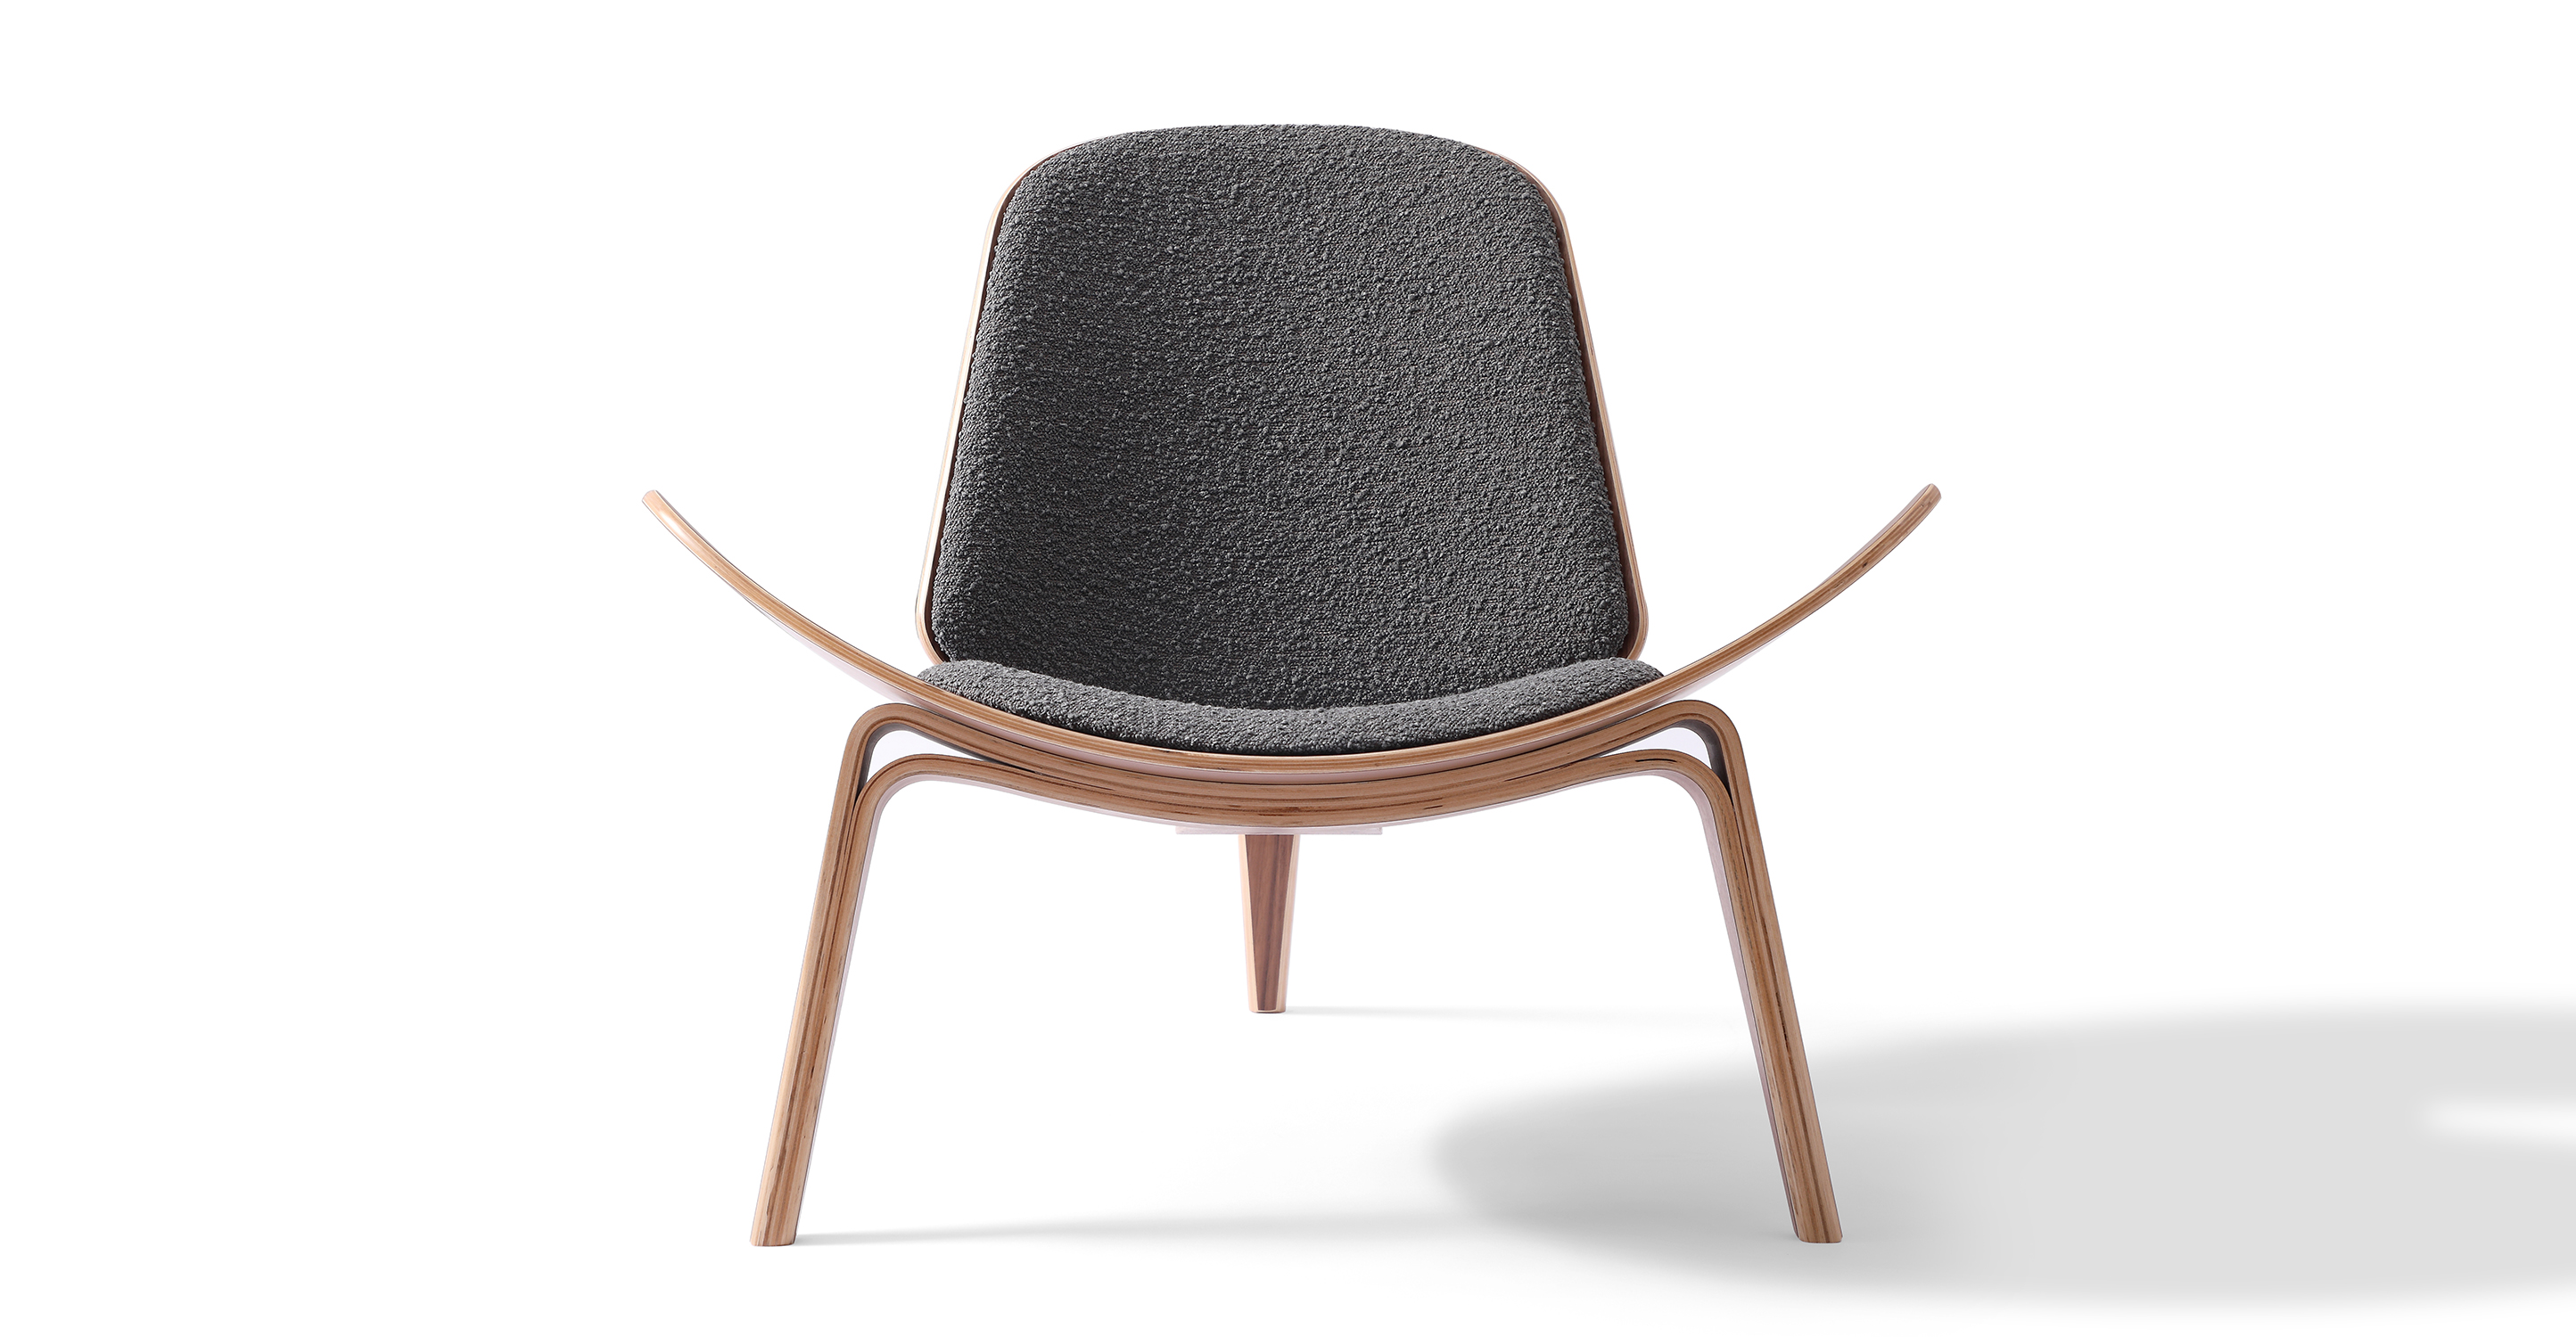 Tripod Fabric Chair 2-pc Set, Walnut/Gris Boucle